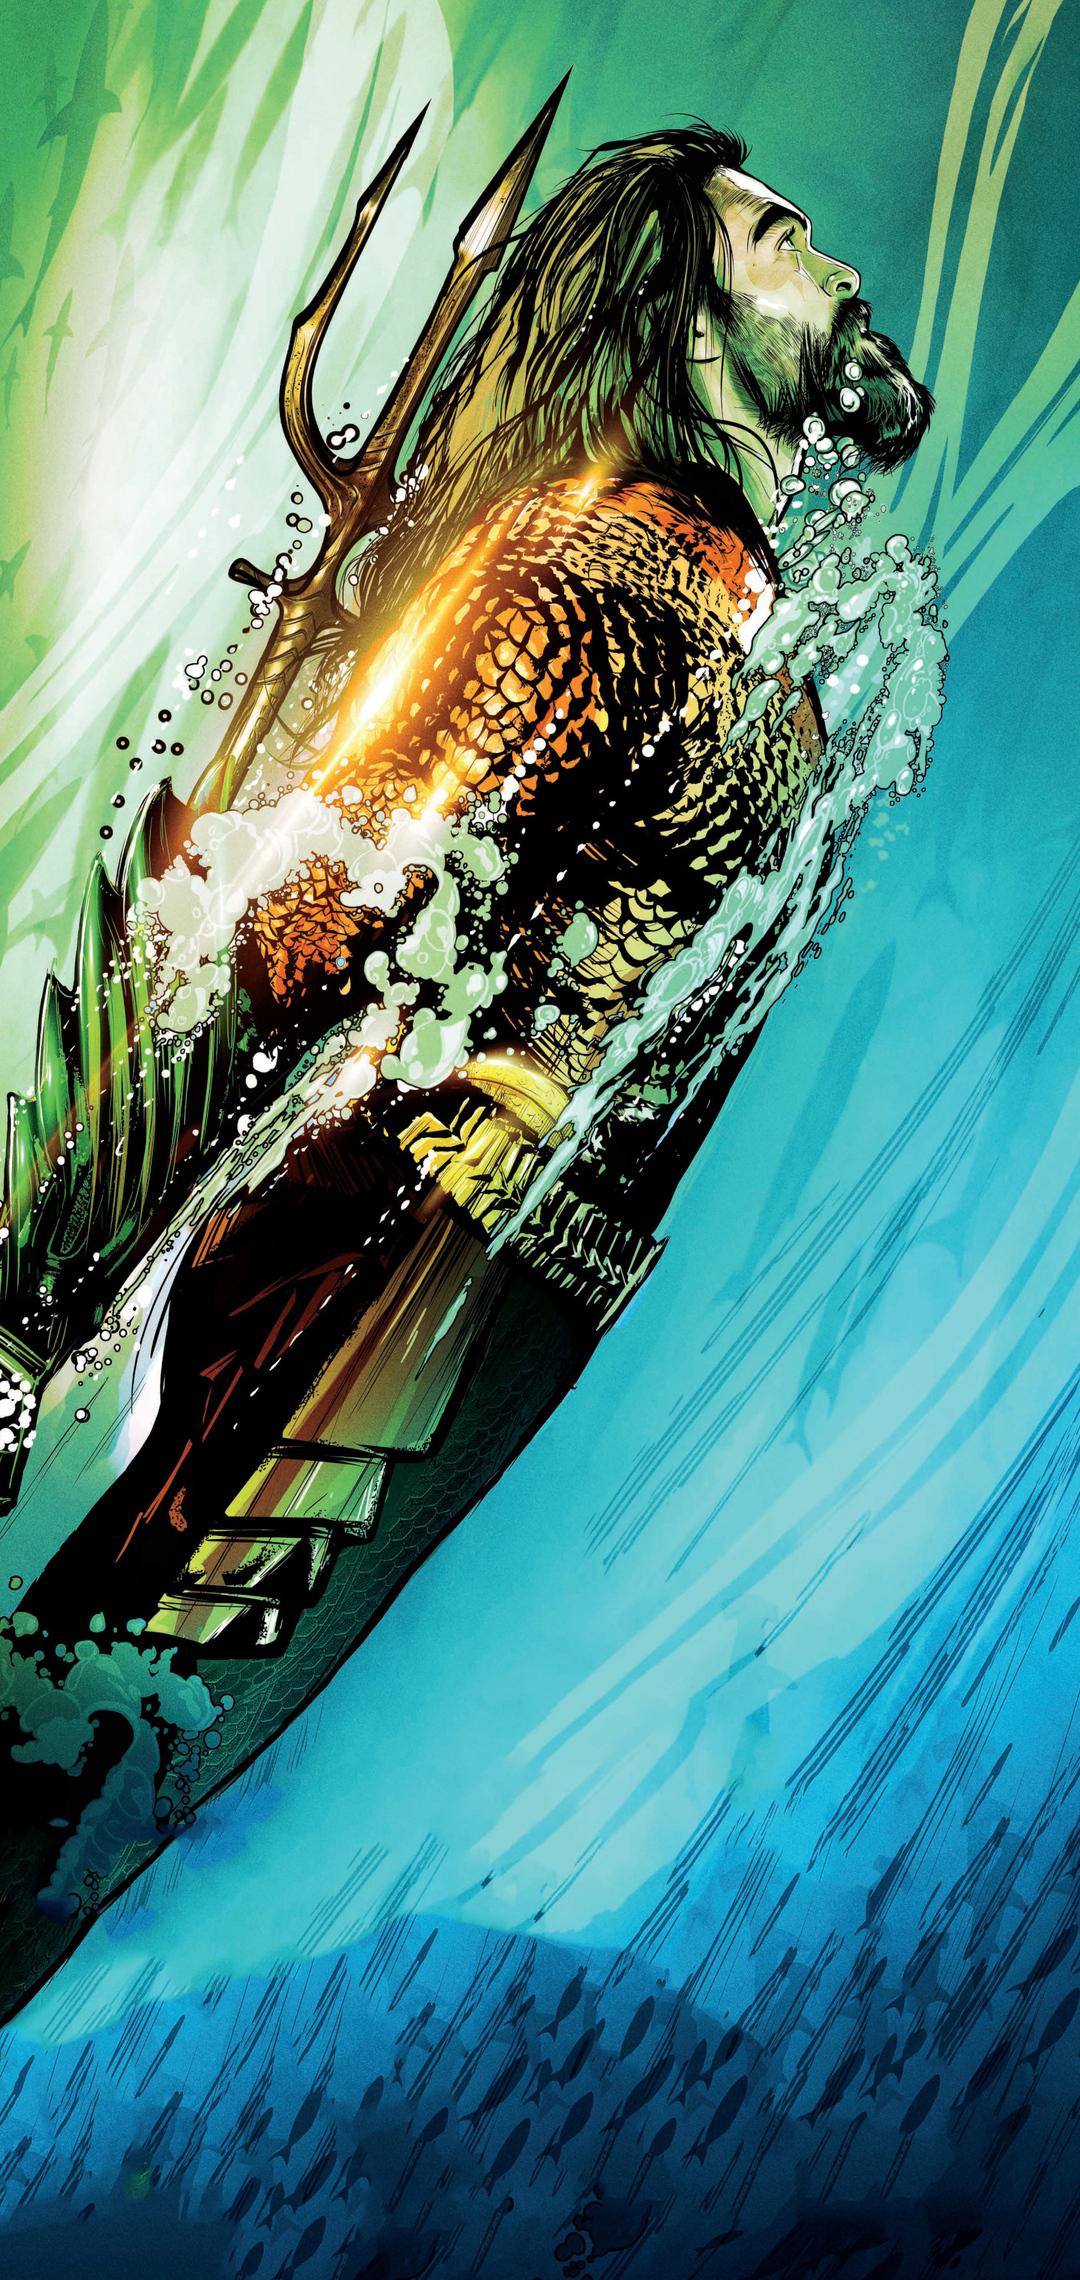 aquaman-us-poster-5v.jpg